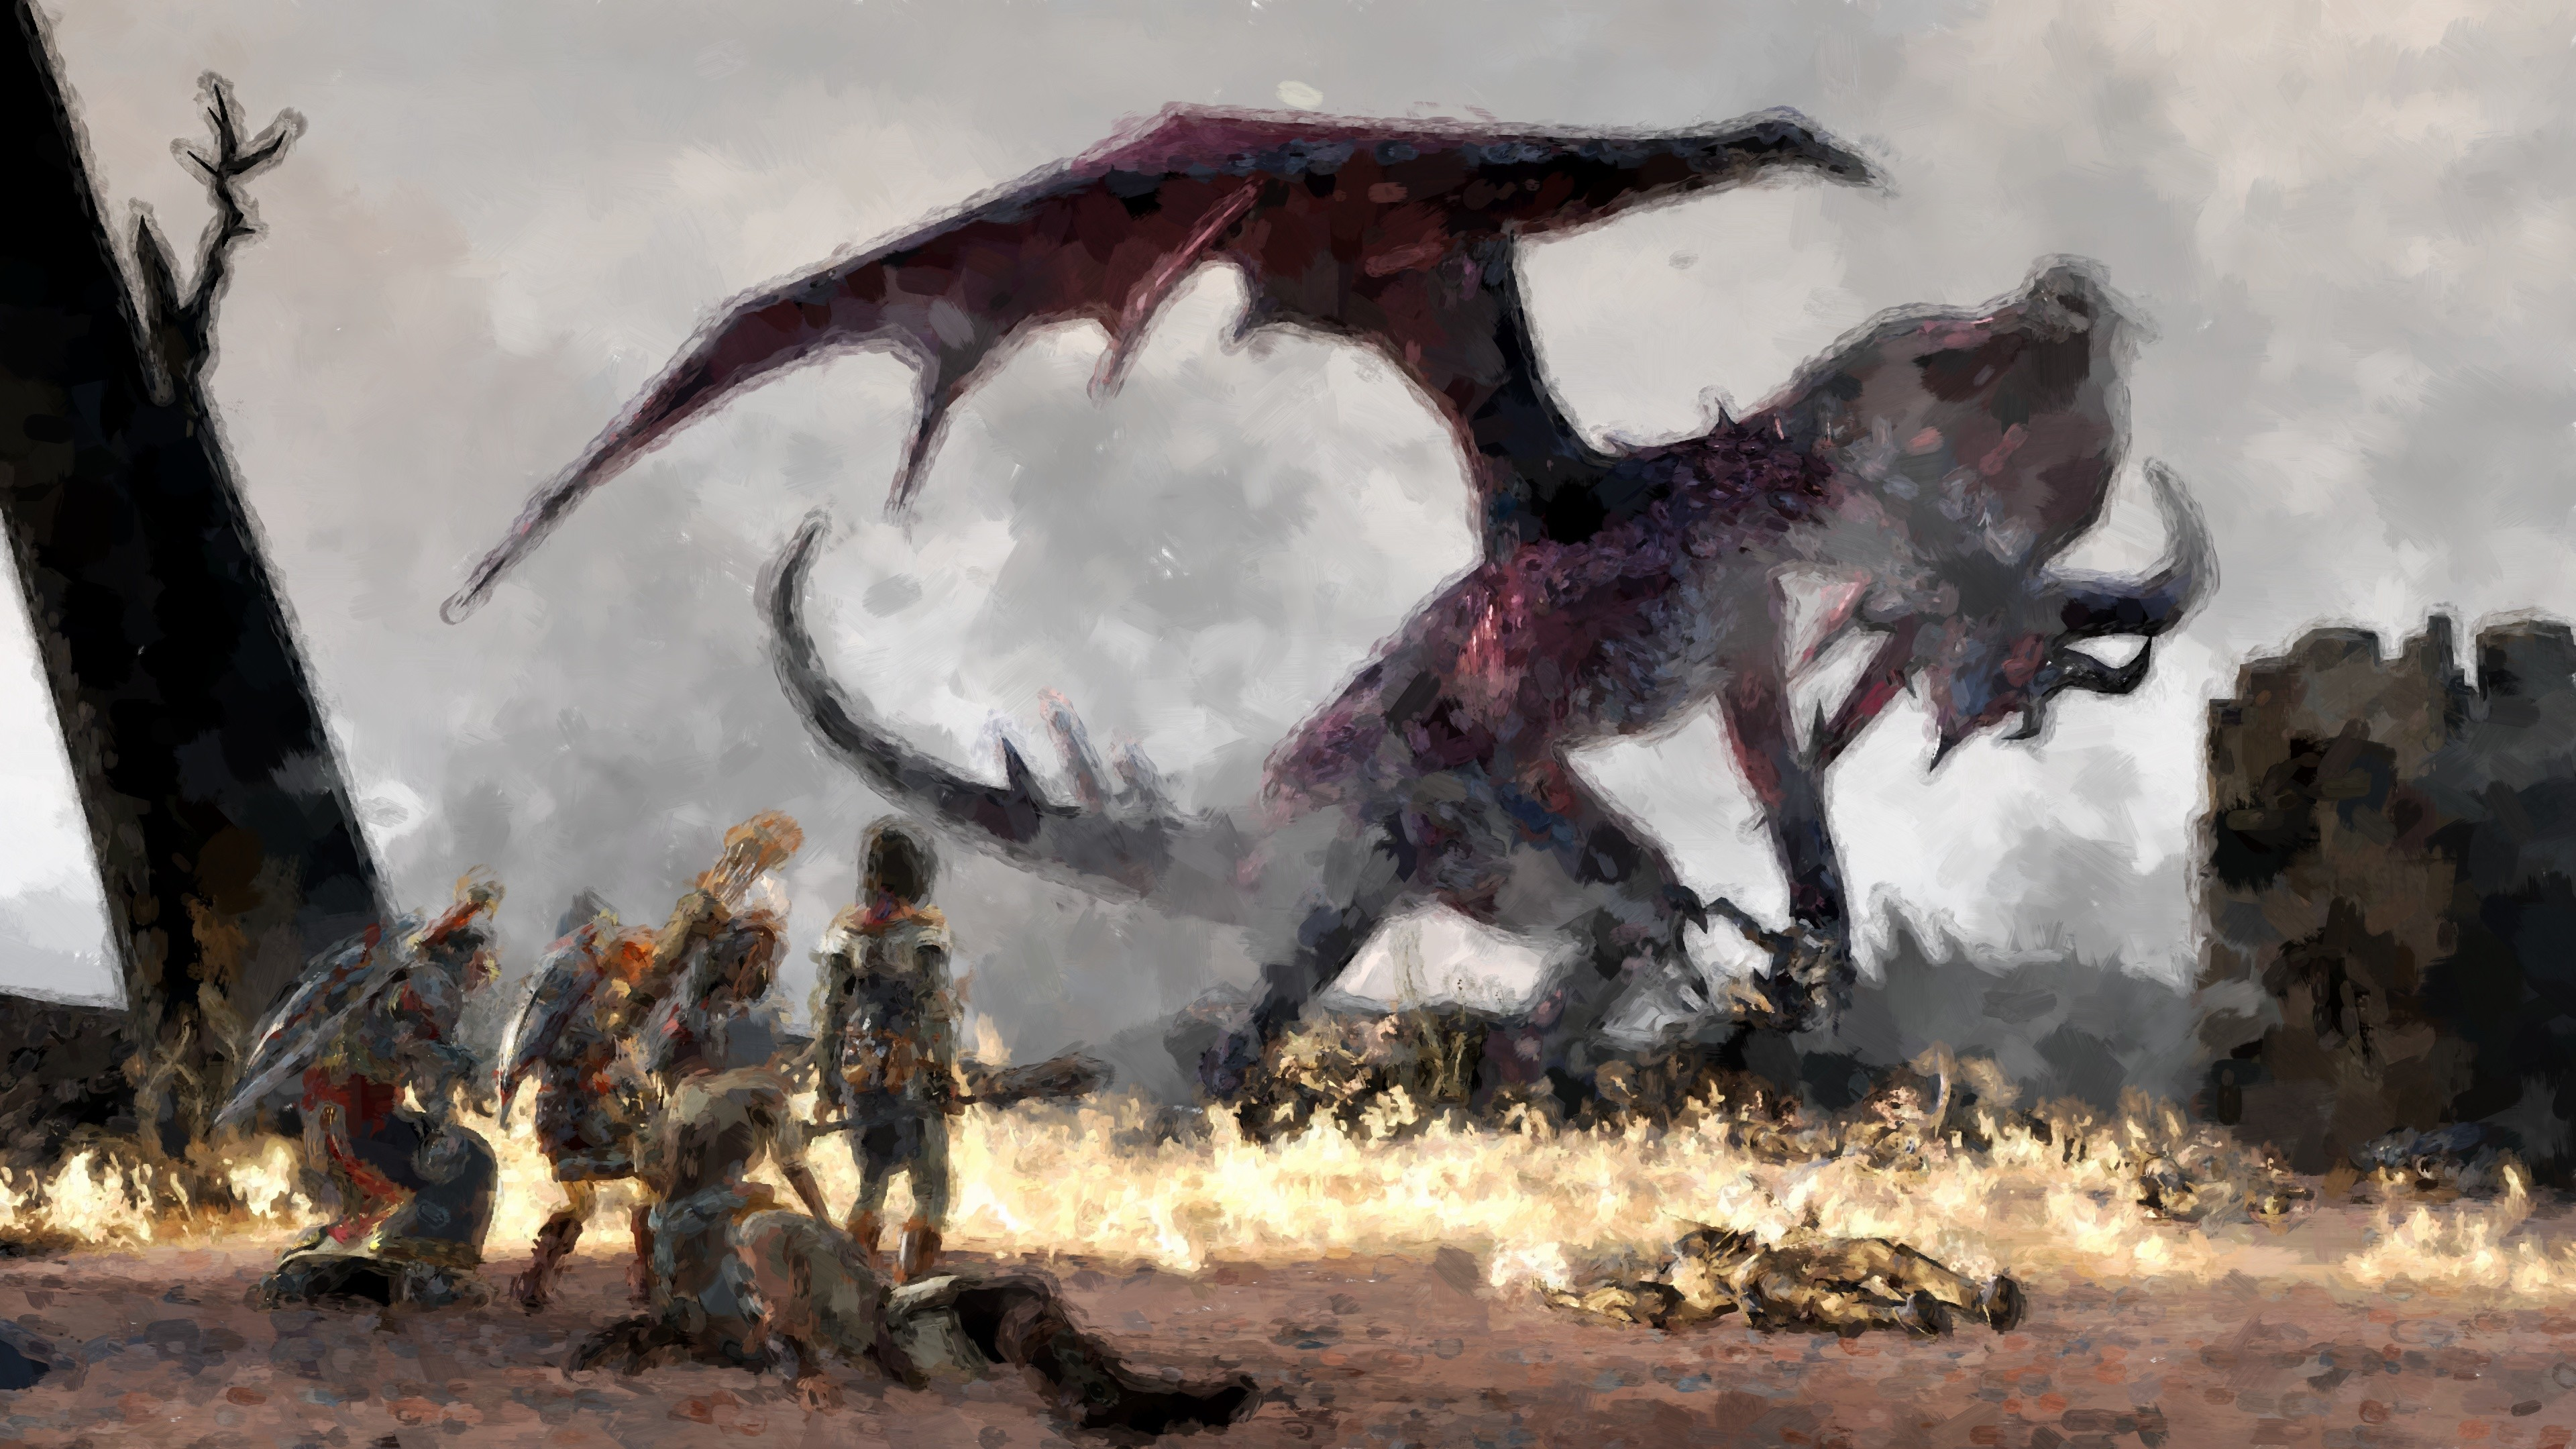 Video Game – Dragon Age II Wallpaper